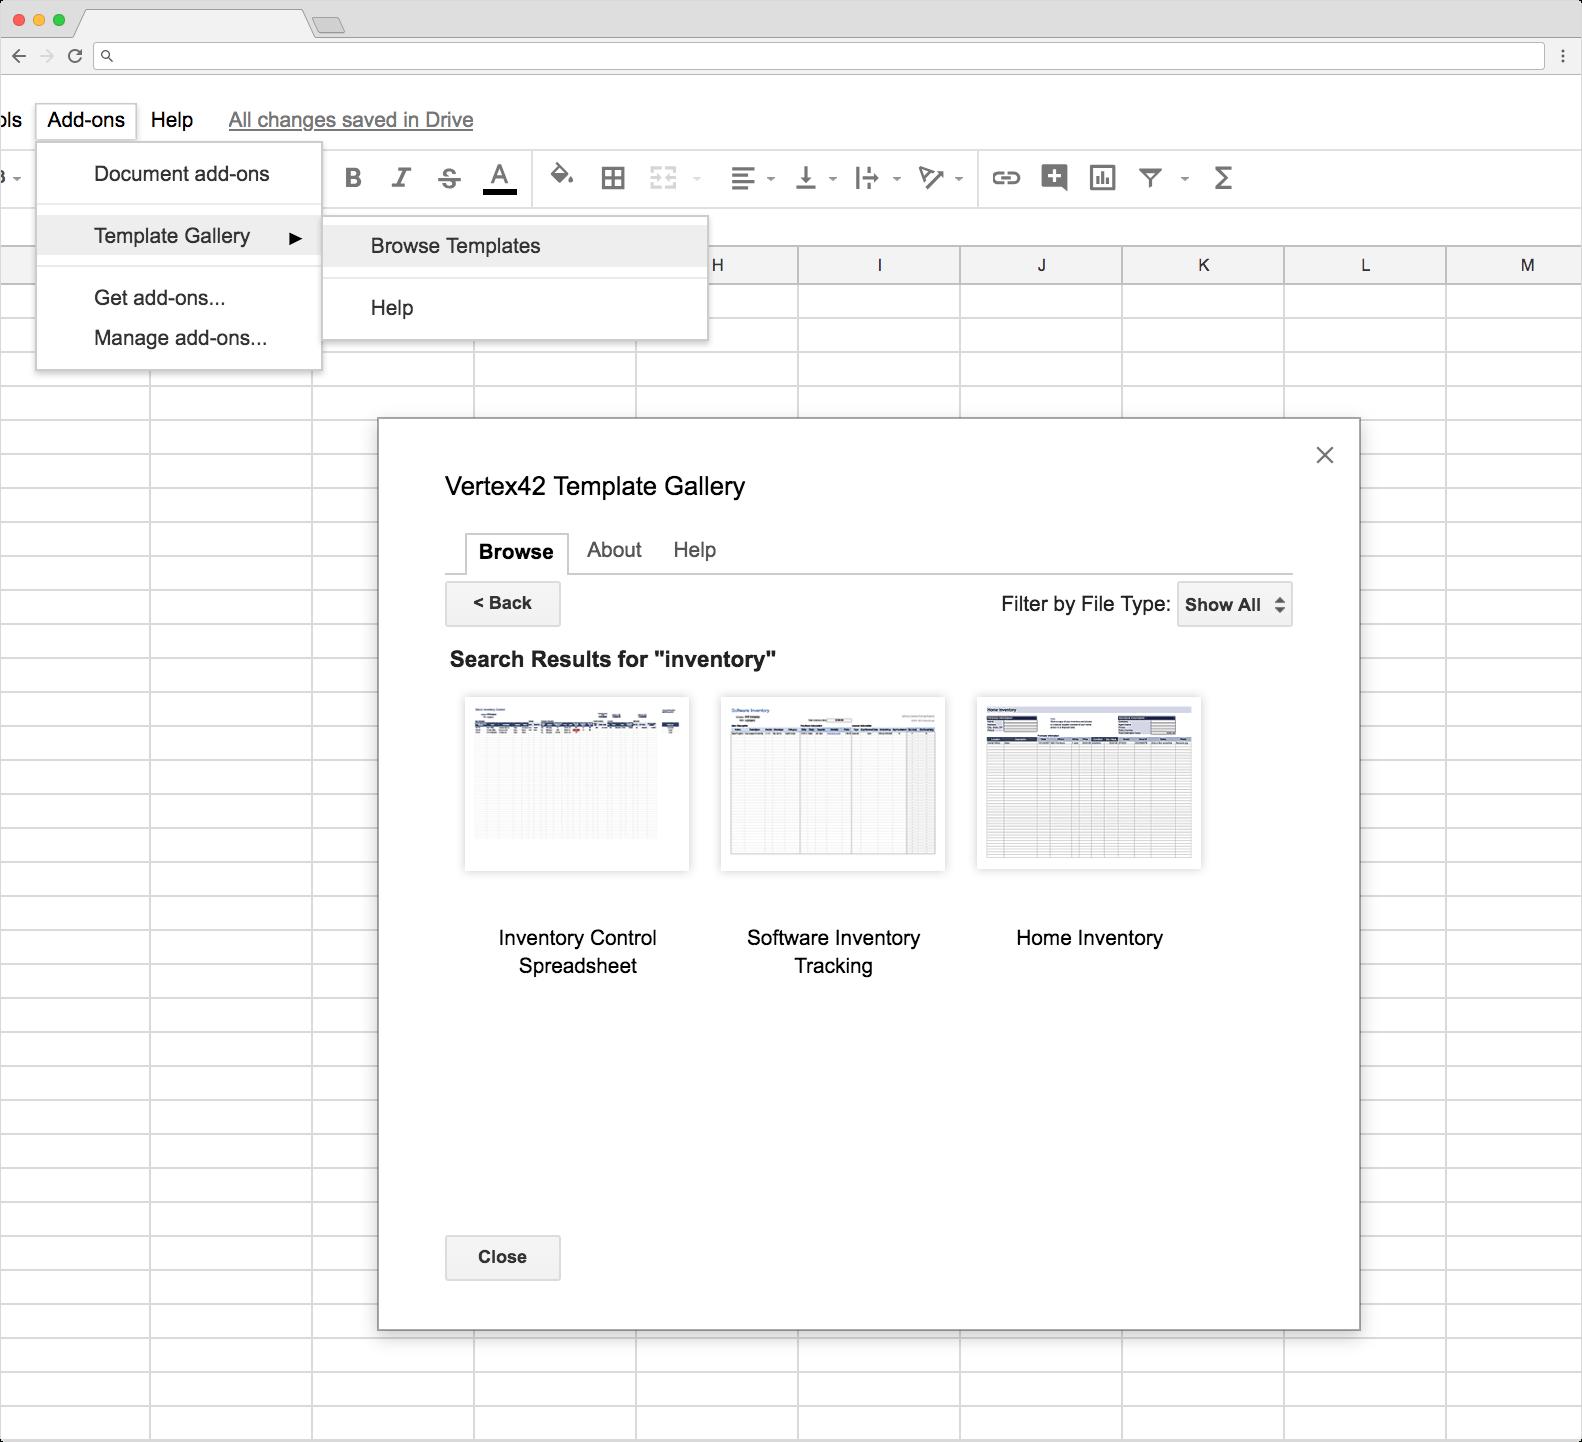 Video Game Inventory Spreadsheet Regarding Top 5 Free Google Sheets Inventory Templates · Blog Sheetgo